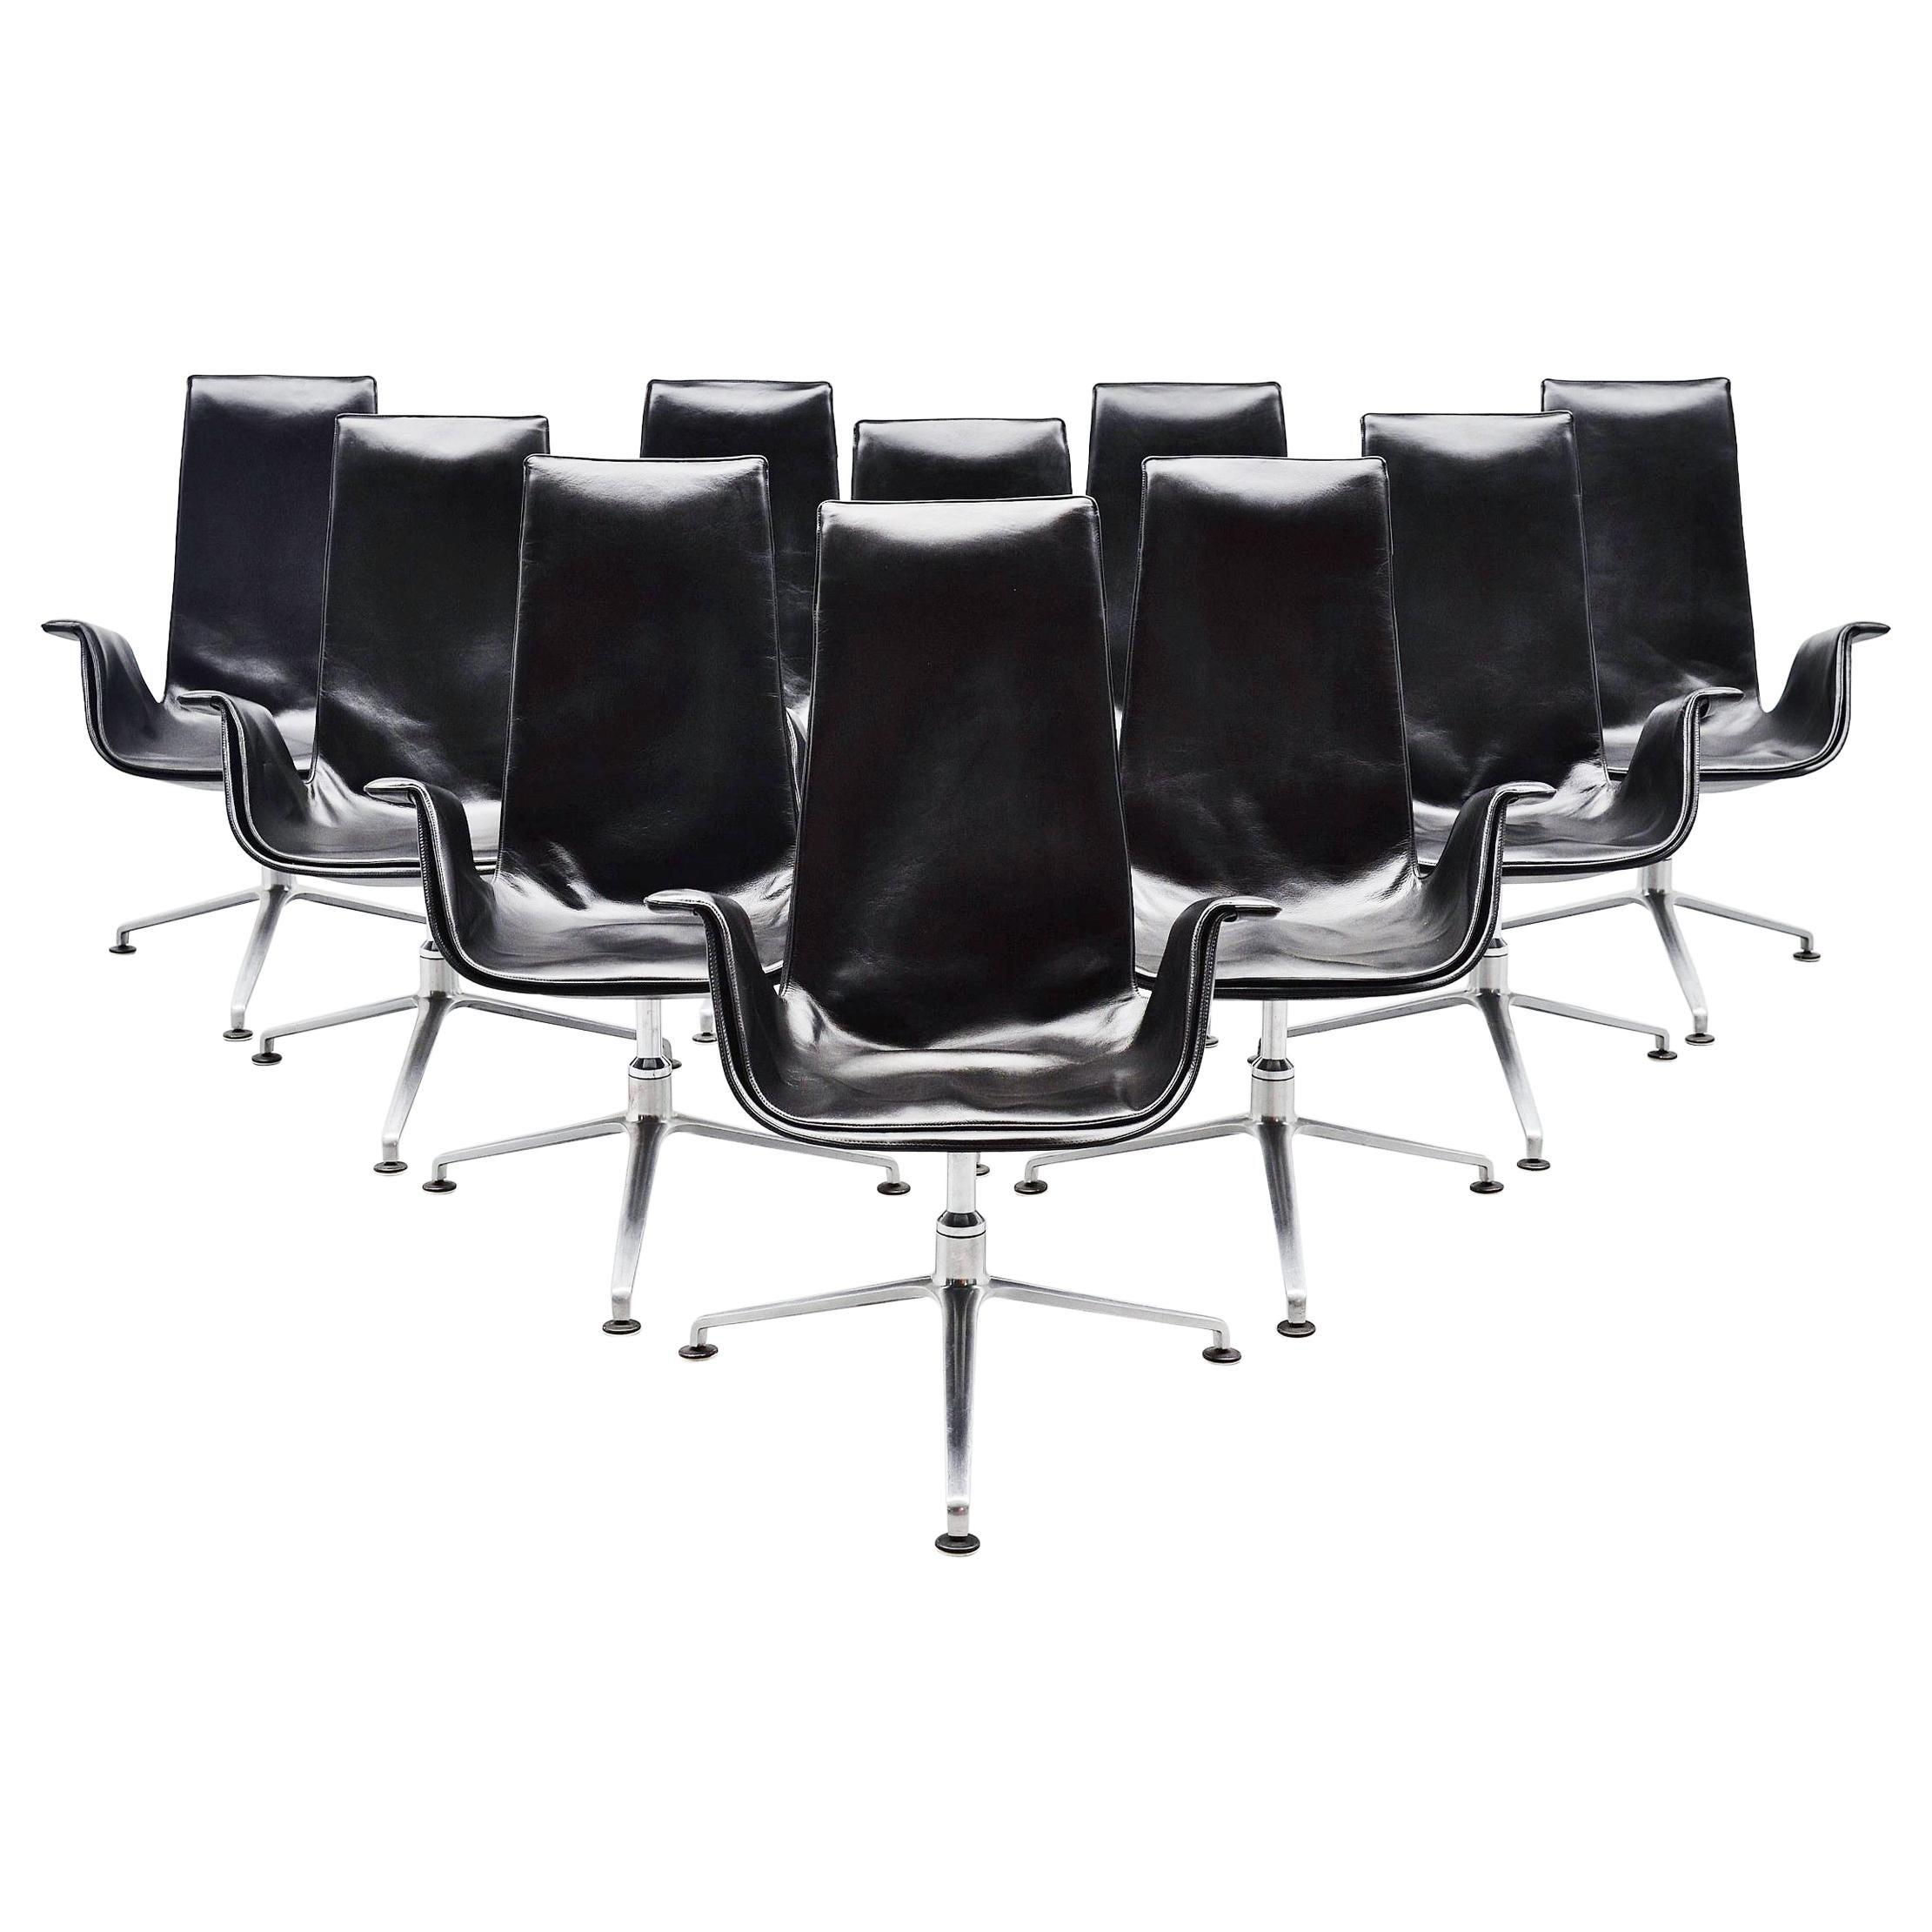 Preben Fabricius Jorgen Kastholm Bird Chairs Set Kill 1964